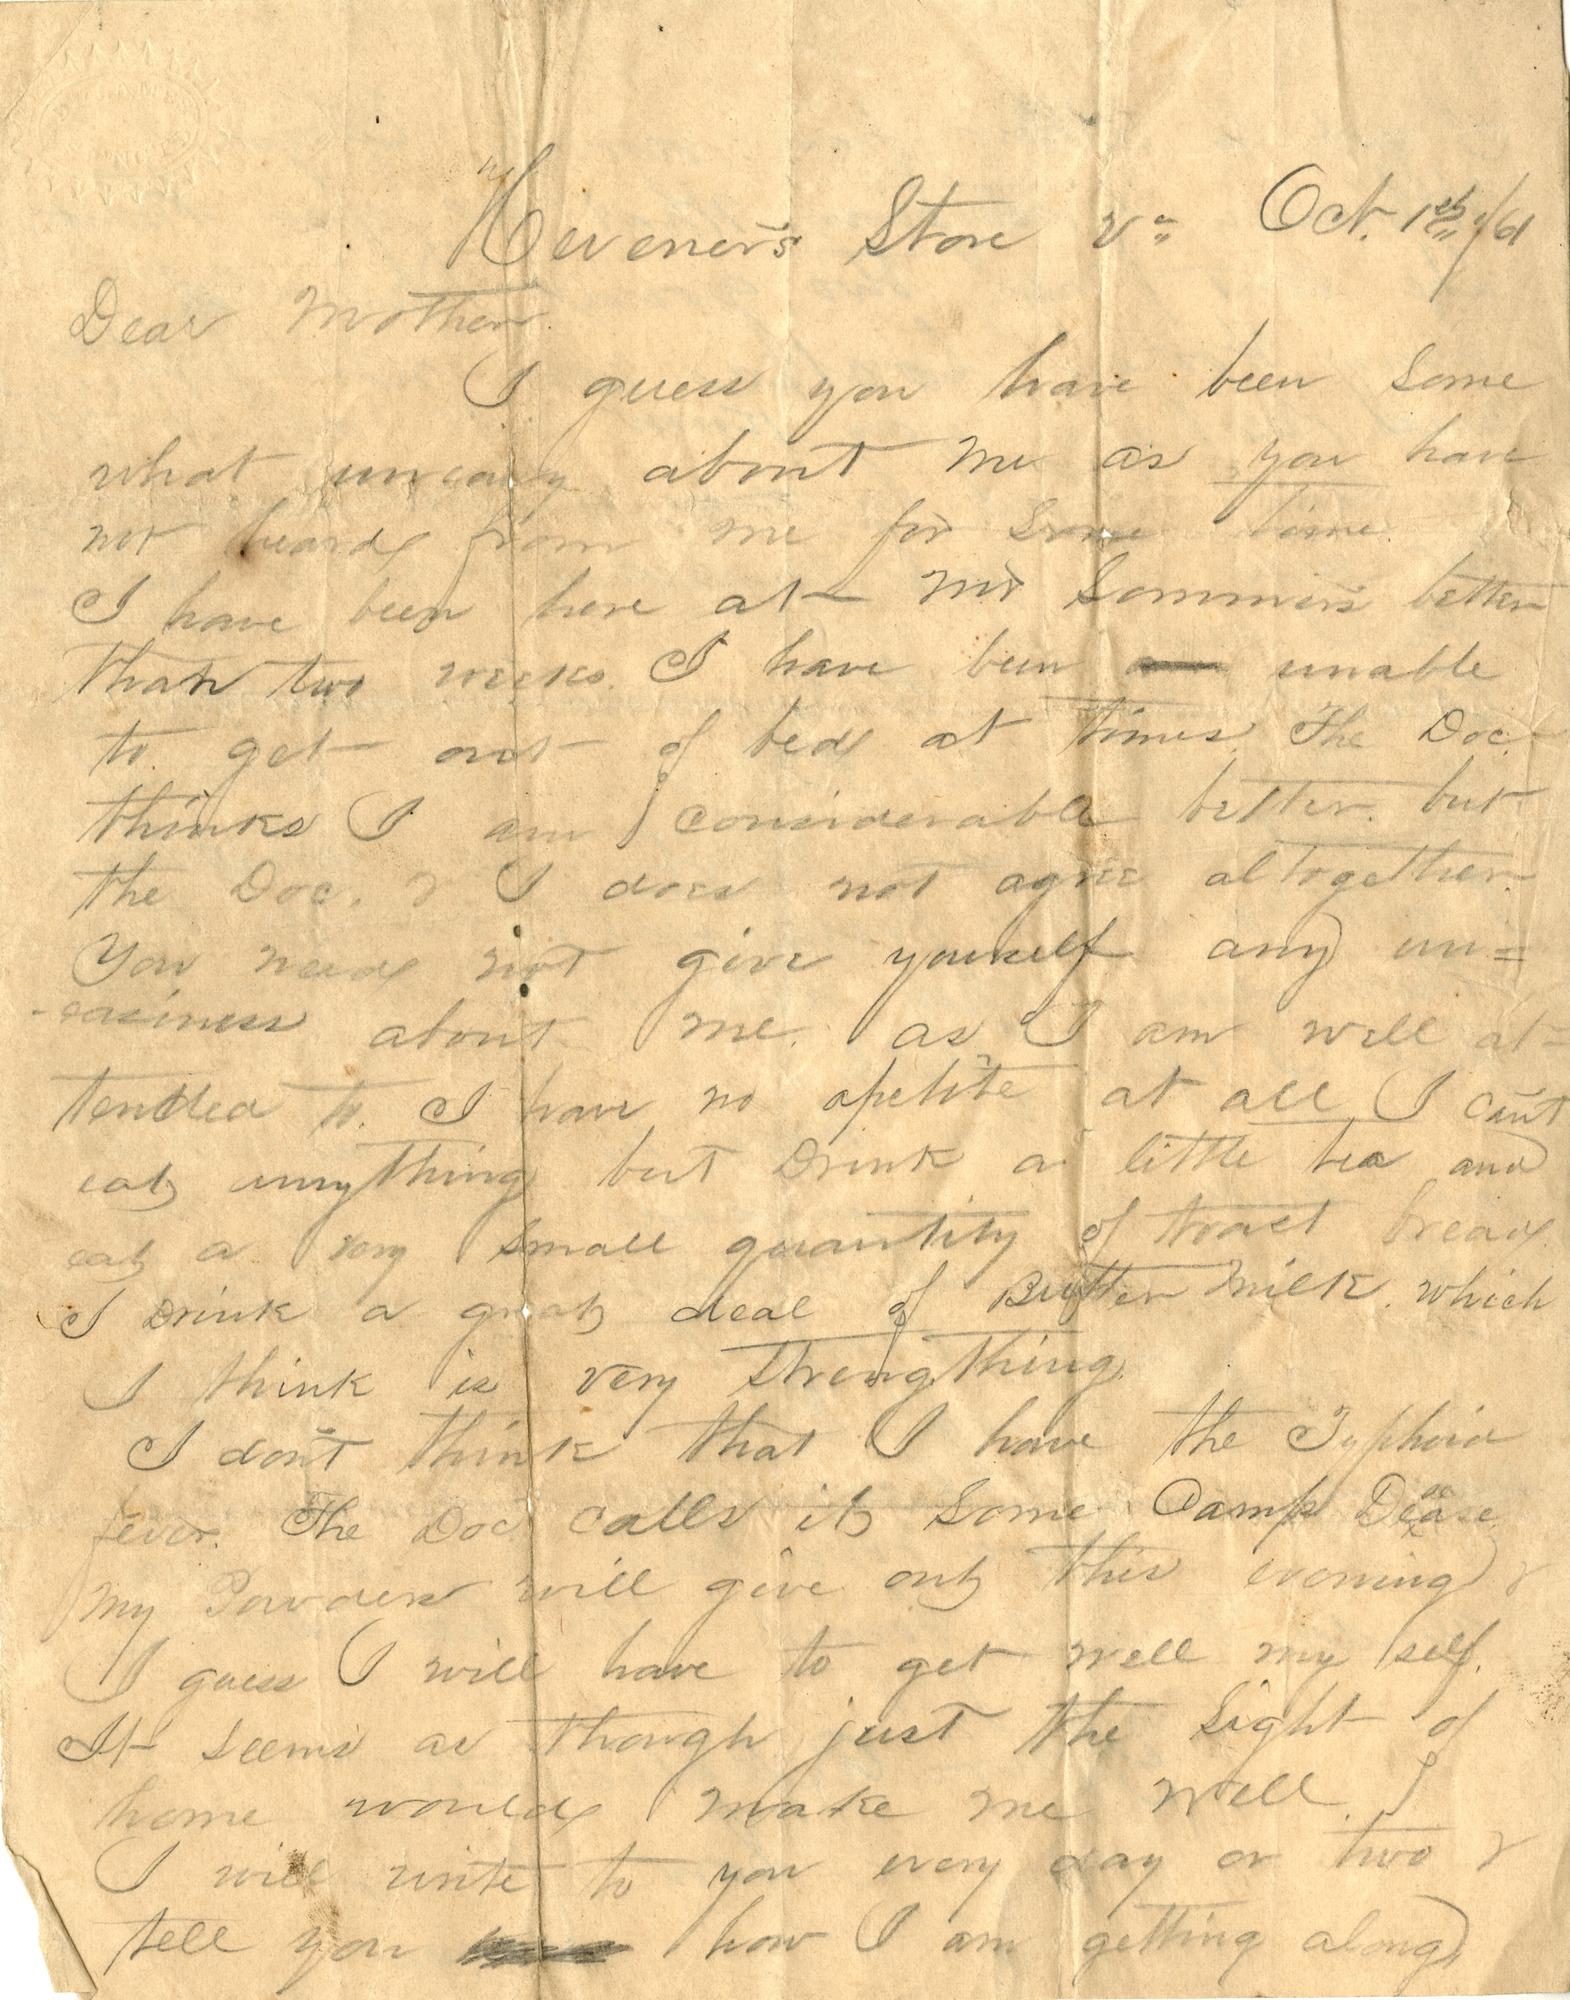 http://spec.lib.vt.edu/pickup/Omeka_upload/Ms1984-172_KoontzFamily_F1_Letter_1861_1001a.jpg